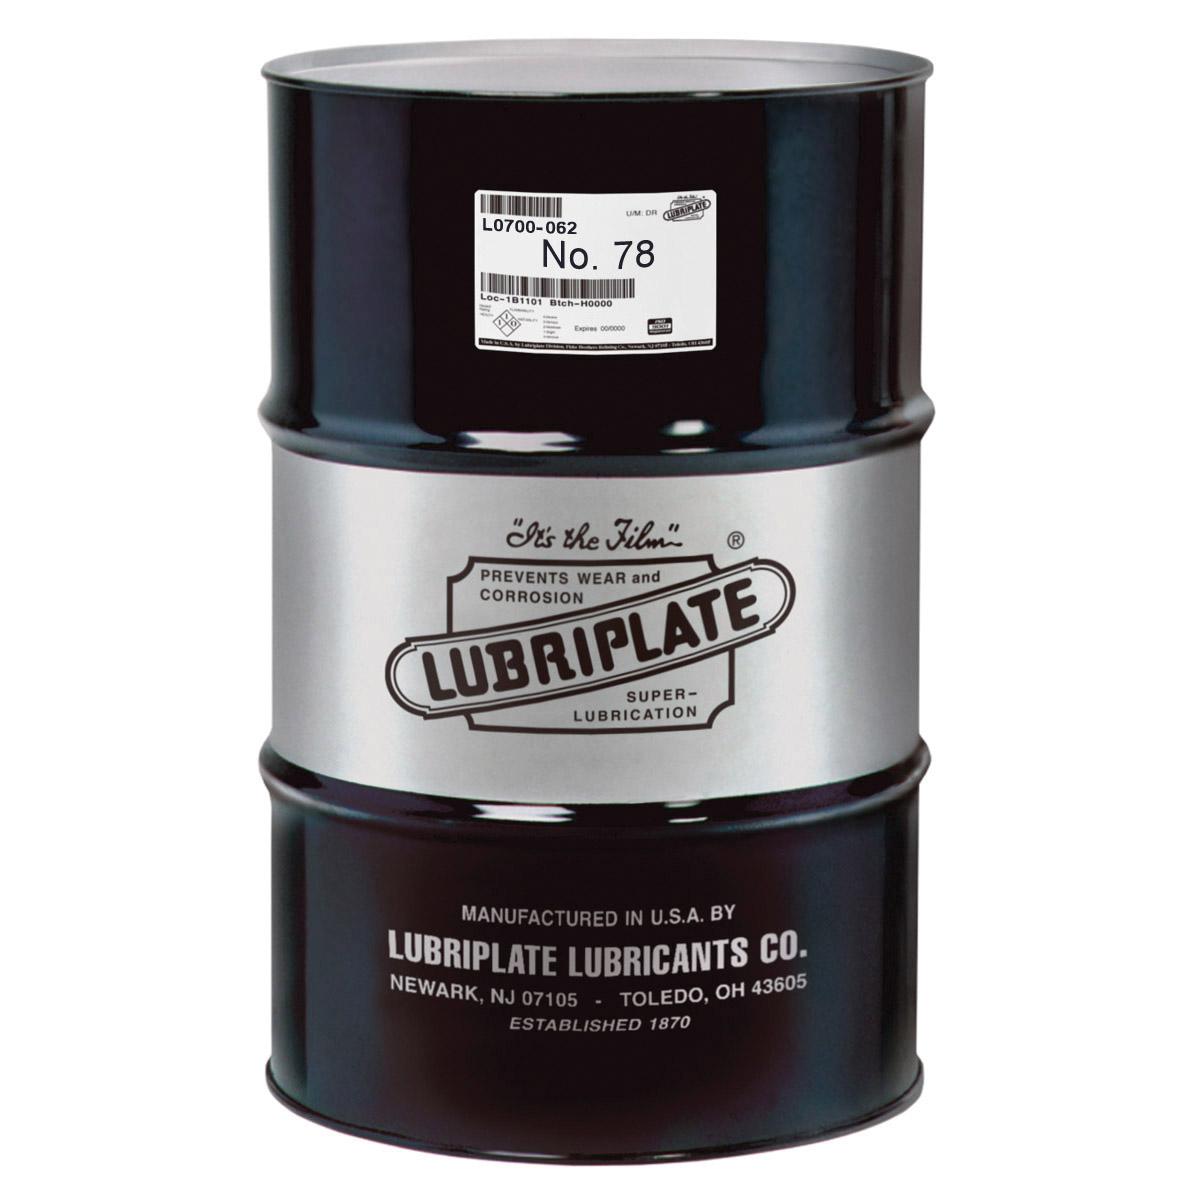 Lubriplate® L0700-062 NO 78 Machine Oil, 55 gal Drum, Mineral Oil Odor/Scent, Liquid Form, Amber